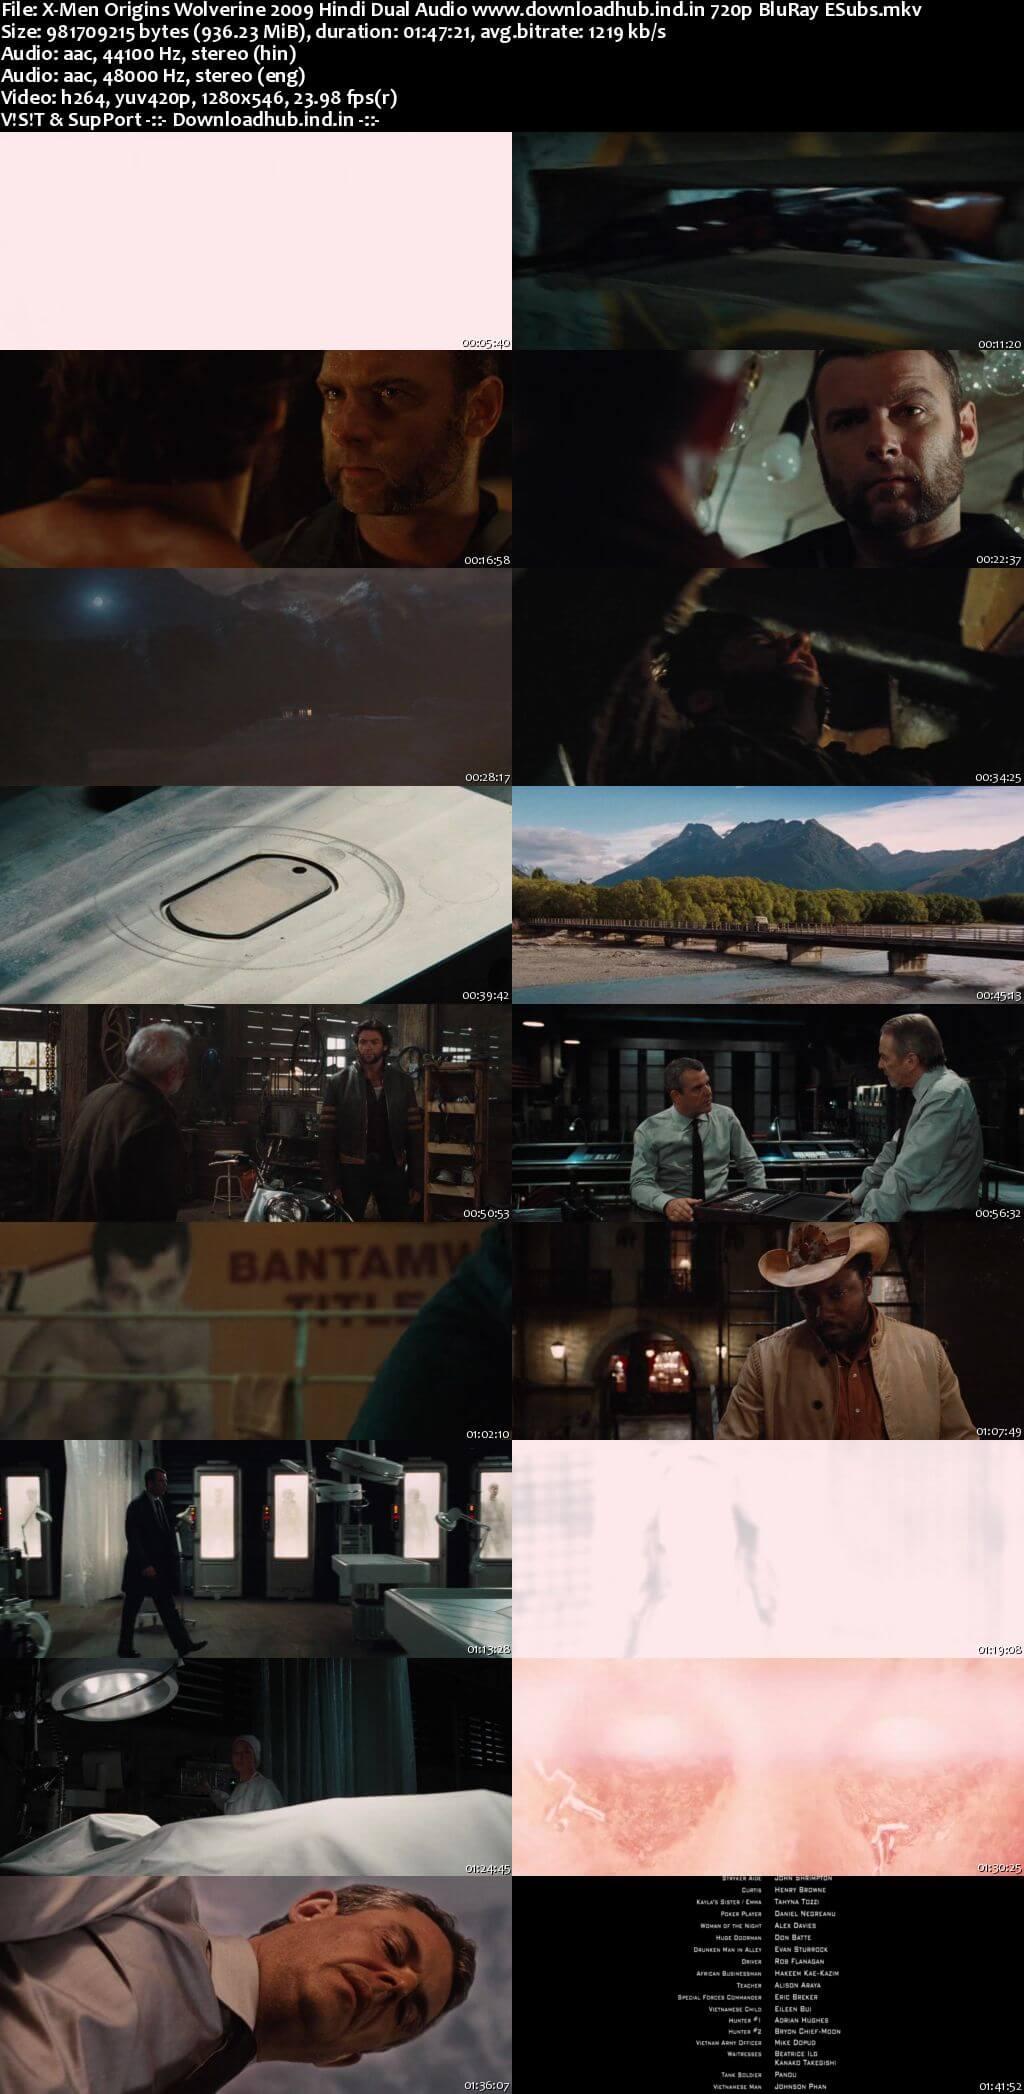 X-Men Origins Wolverine 2009 Hindi Dual Audio 720p BluRay ESubs